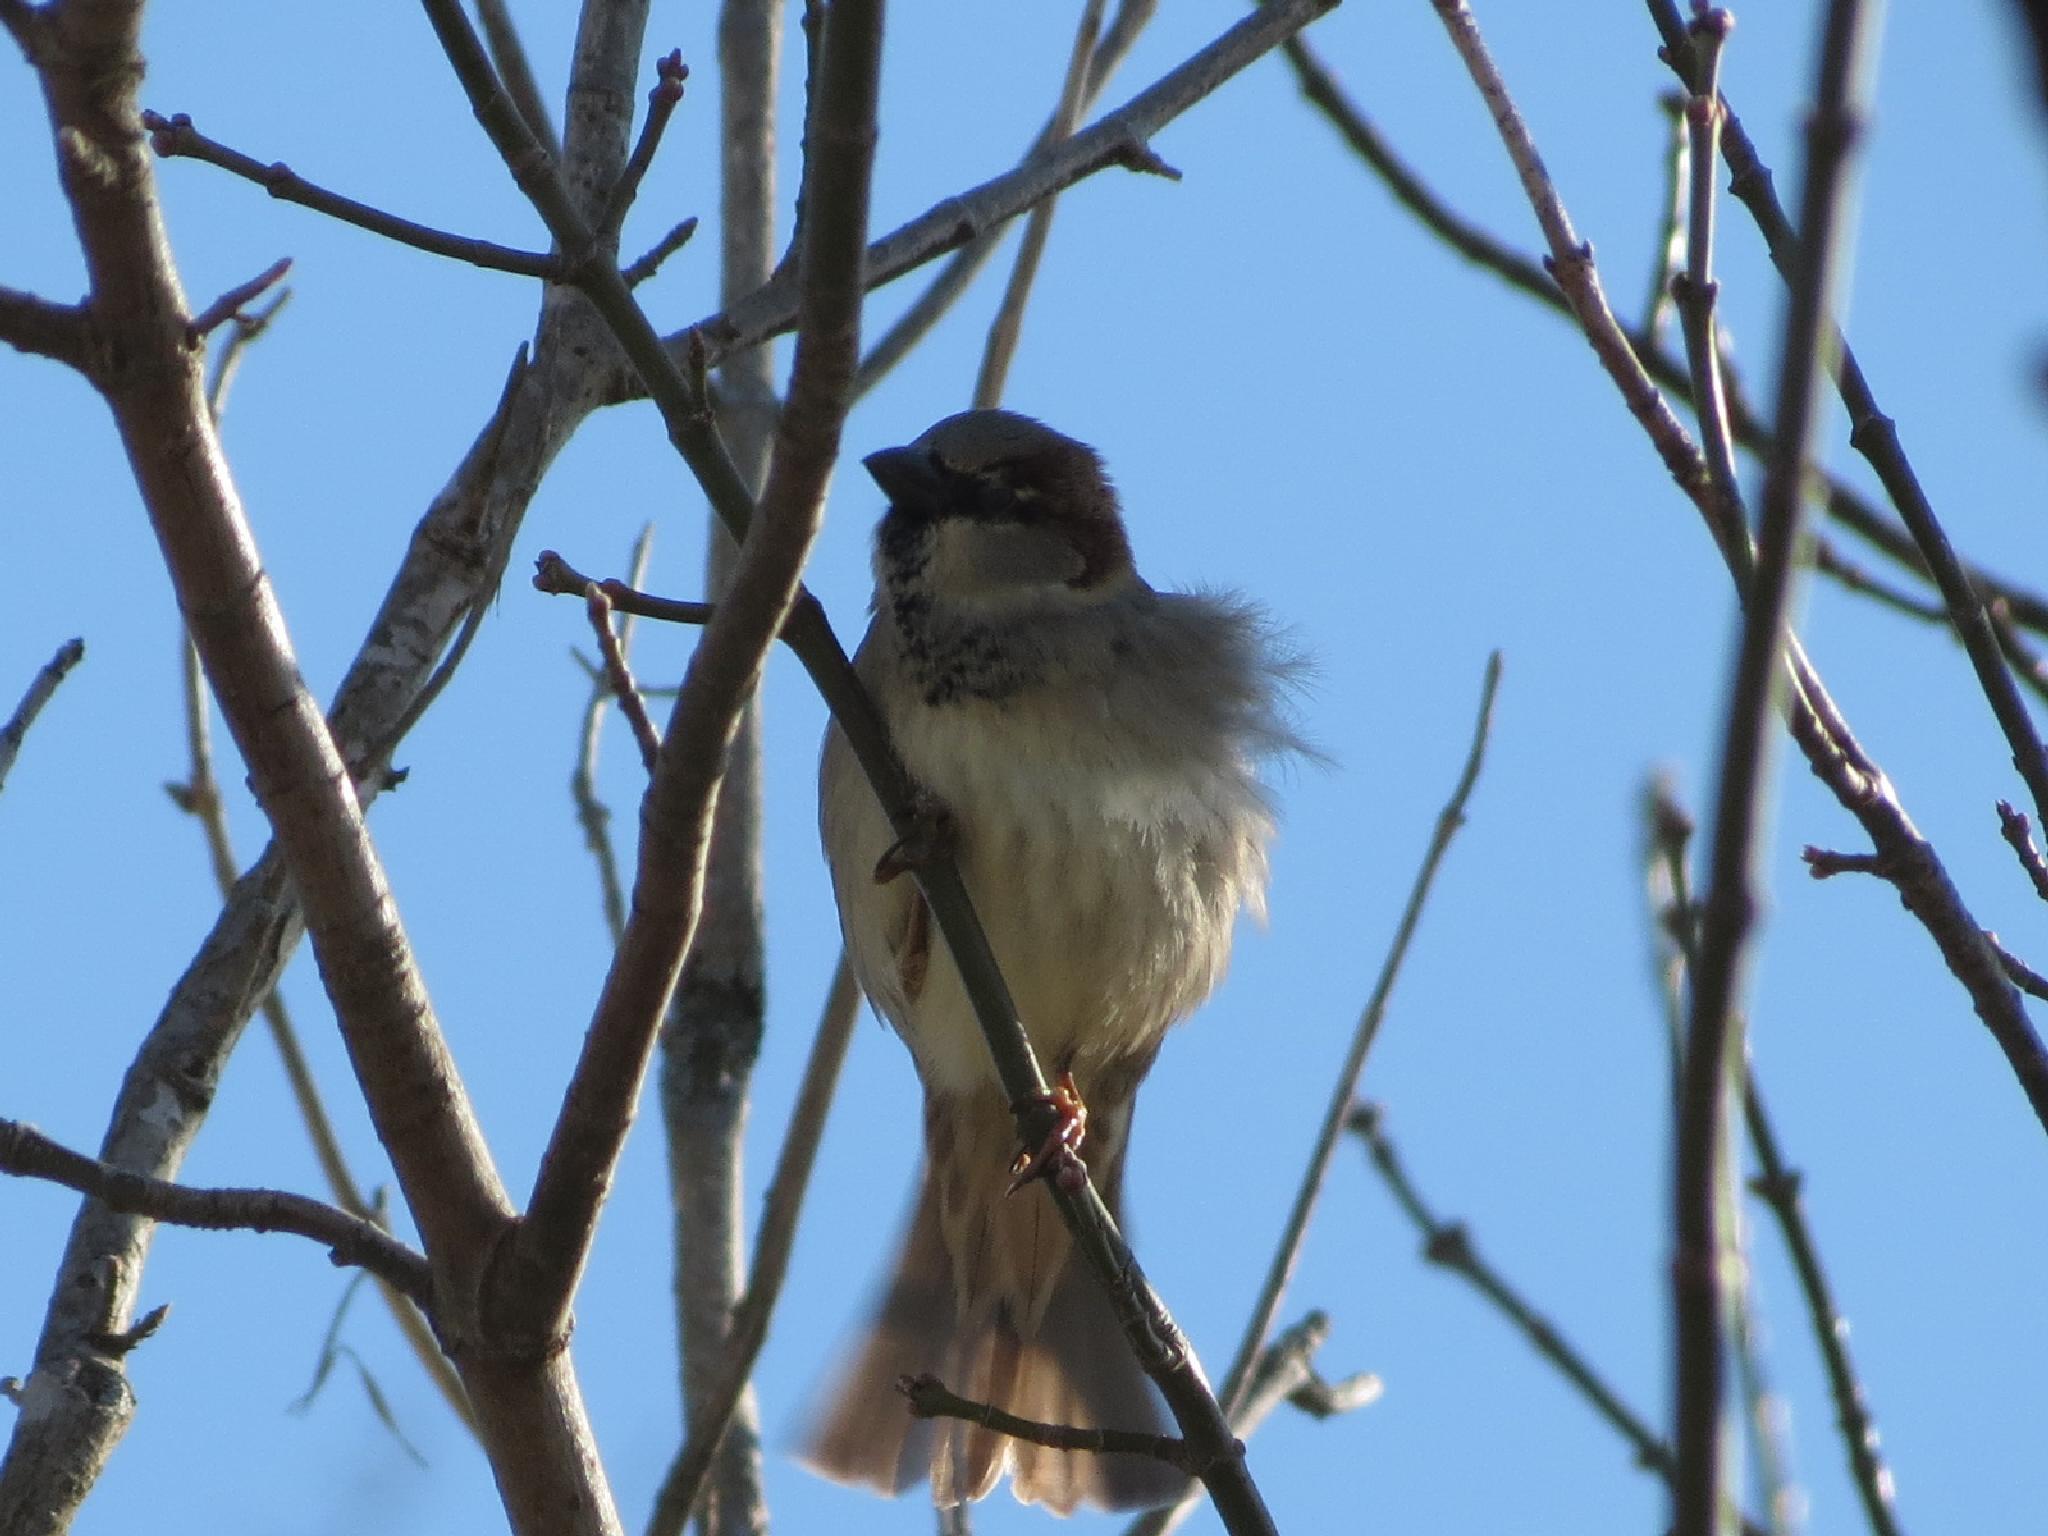 Sparrow enjoys the Breeze by pauline.burden.60